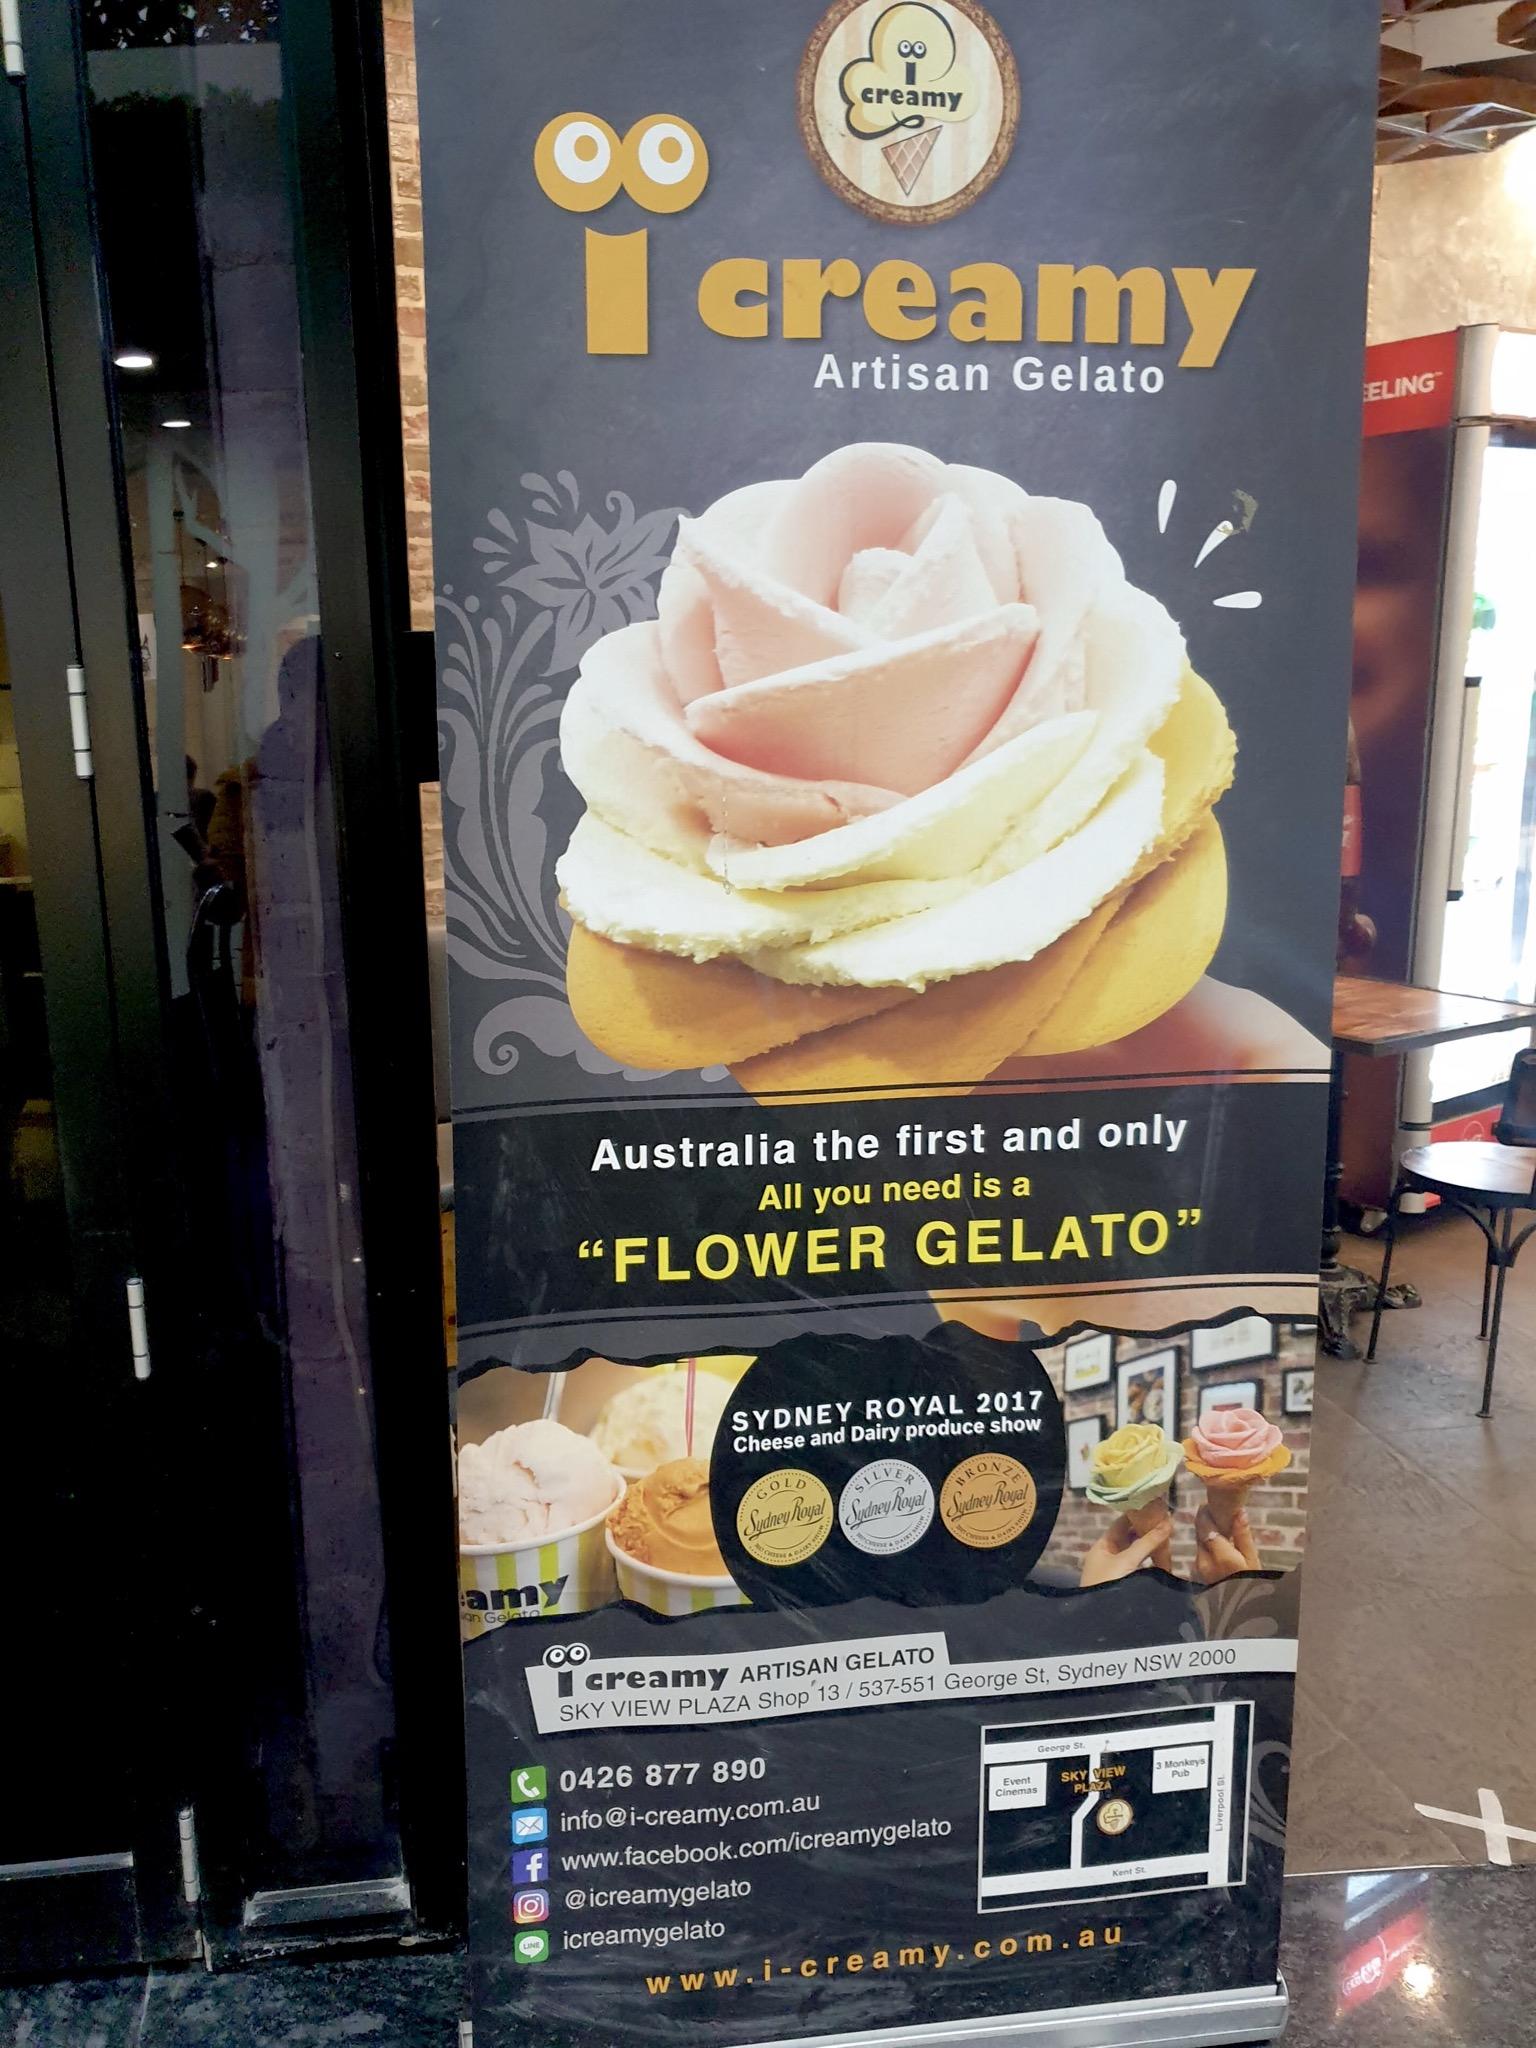 i-creamy Artisan Gelato